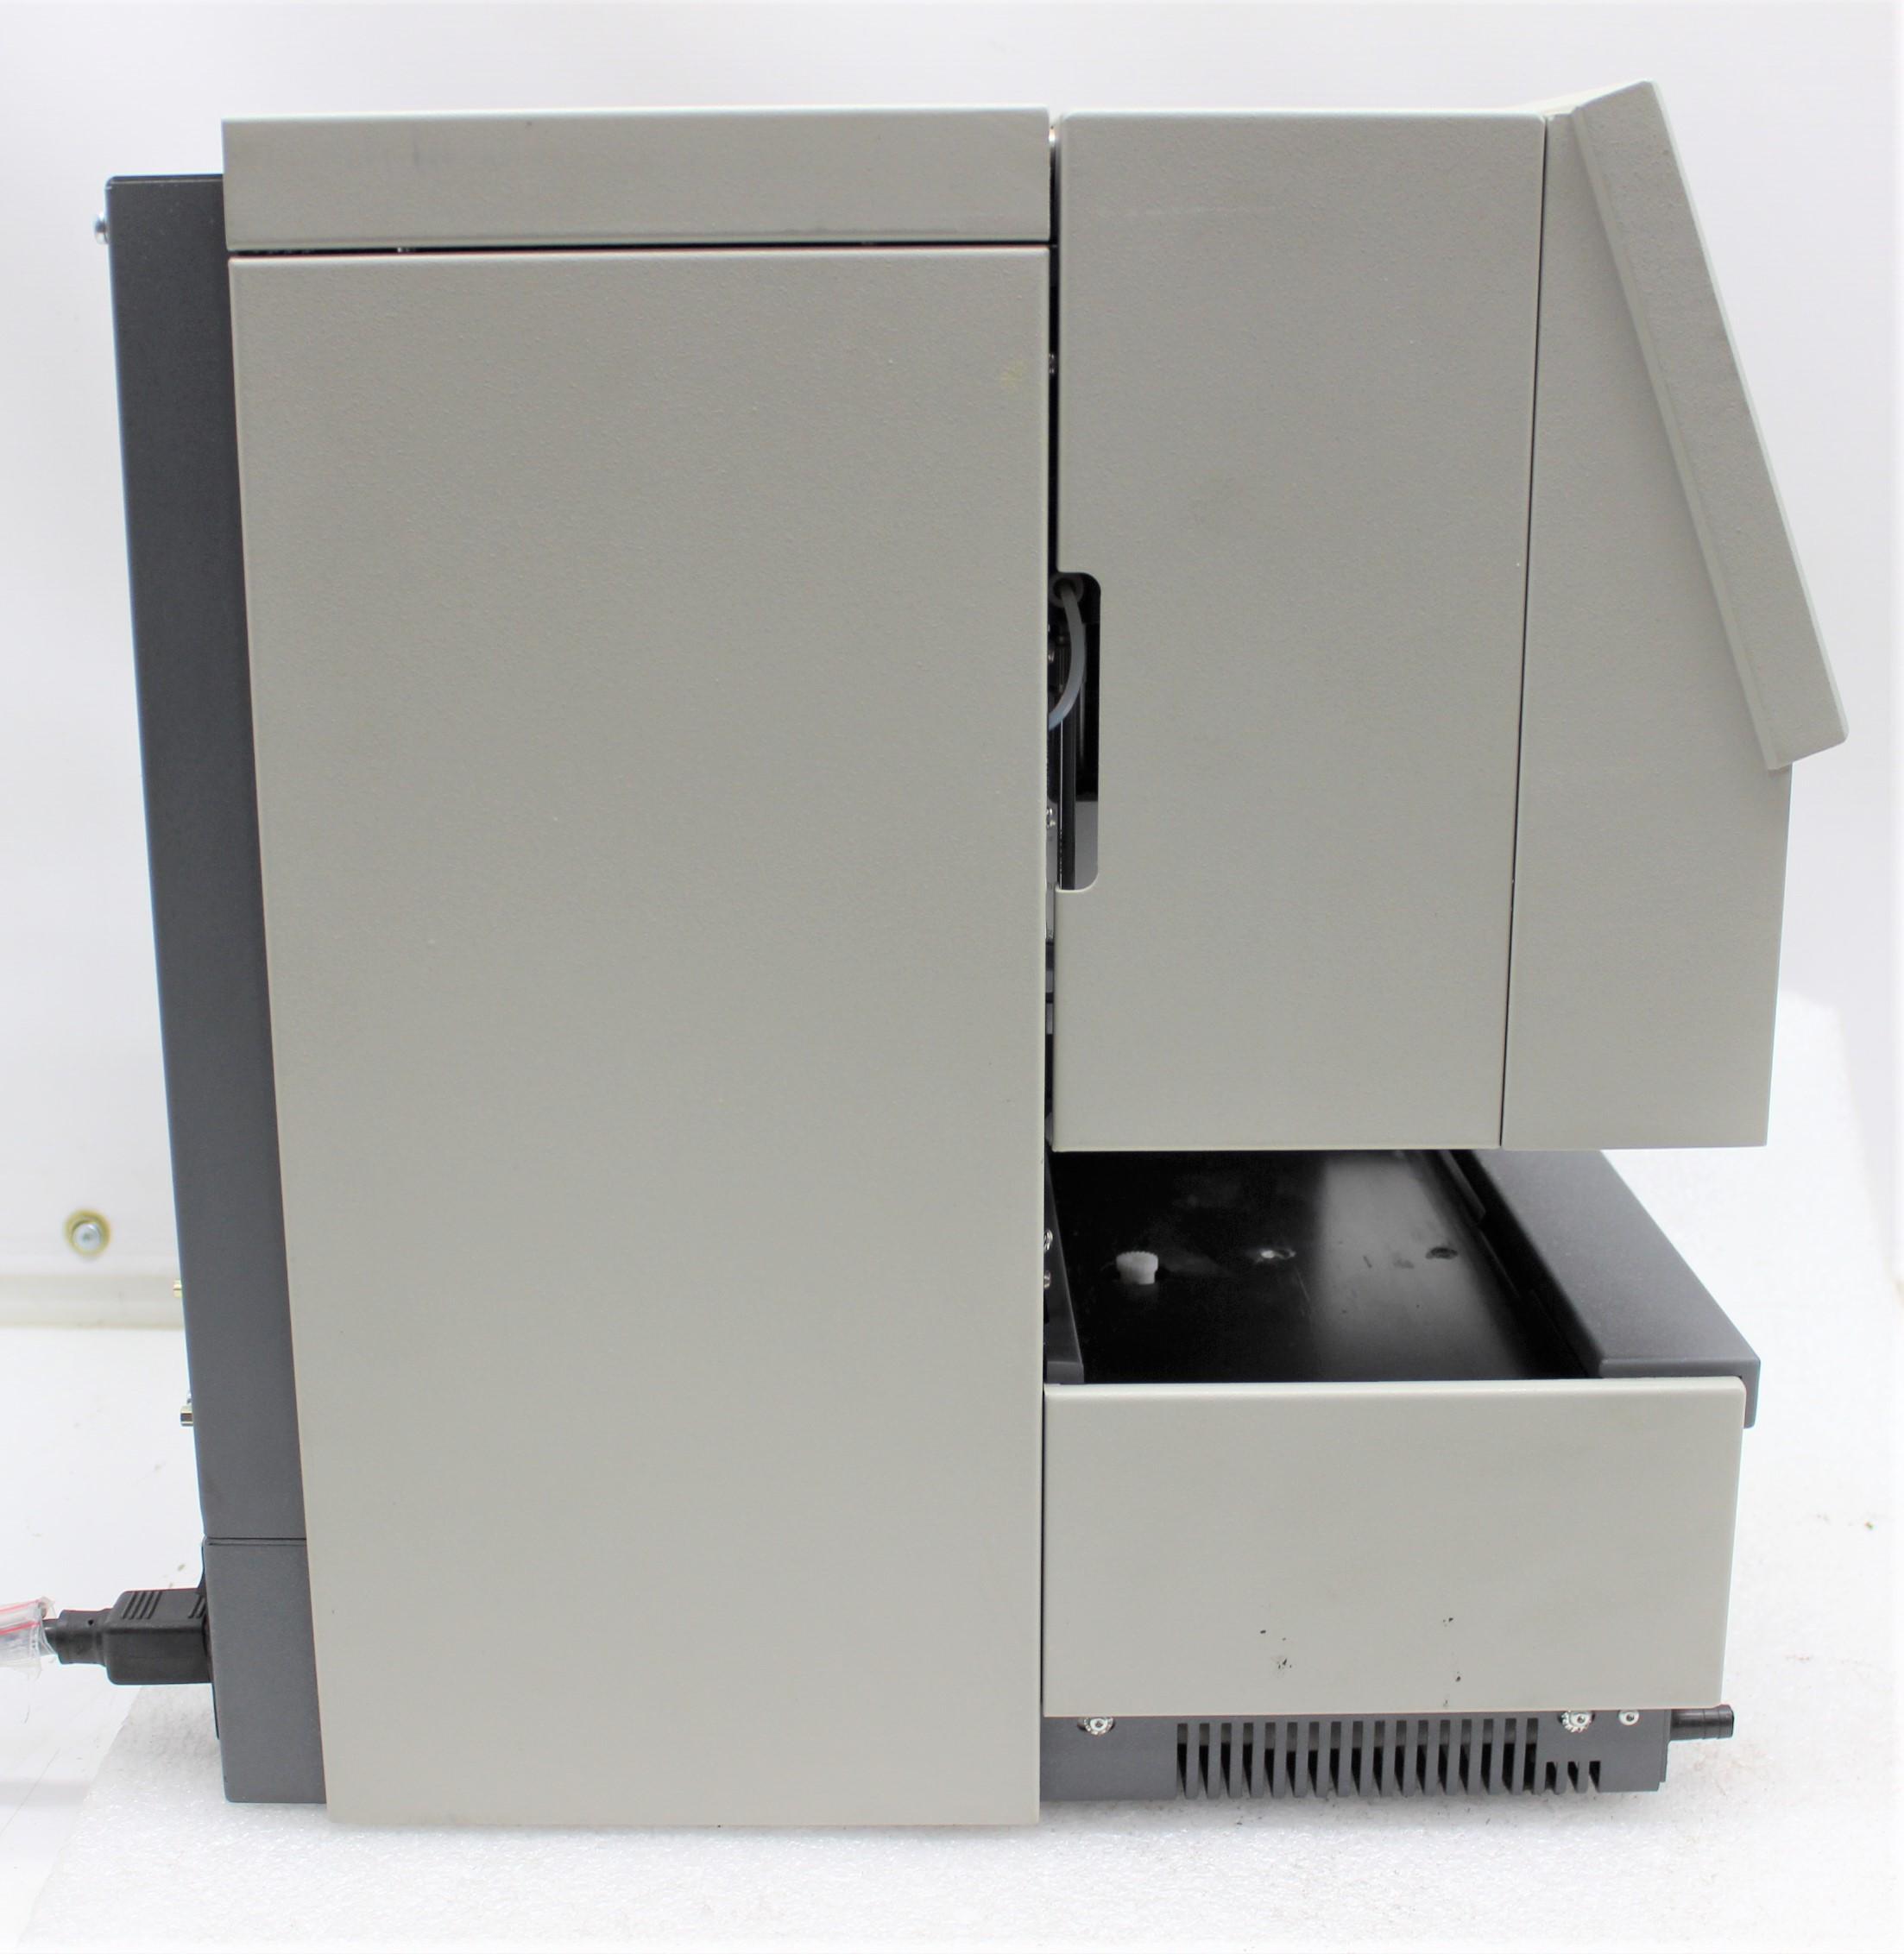 Image APPLIED BIOSYSTEMS MDS SCIEX Tempo Nano Autosampler 1587235